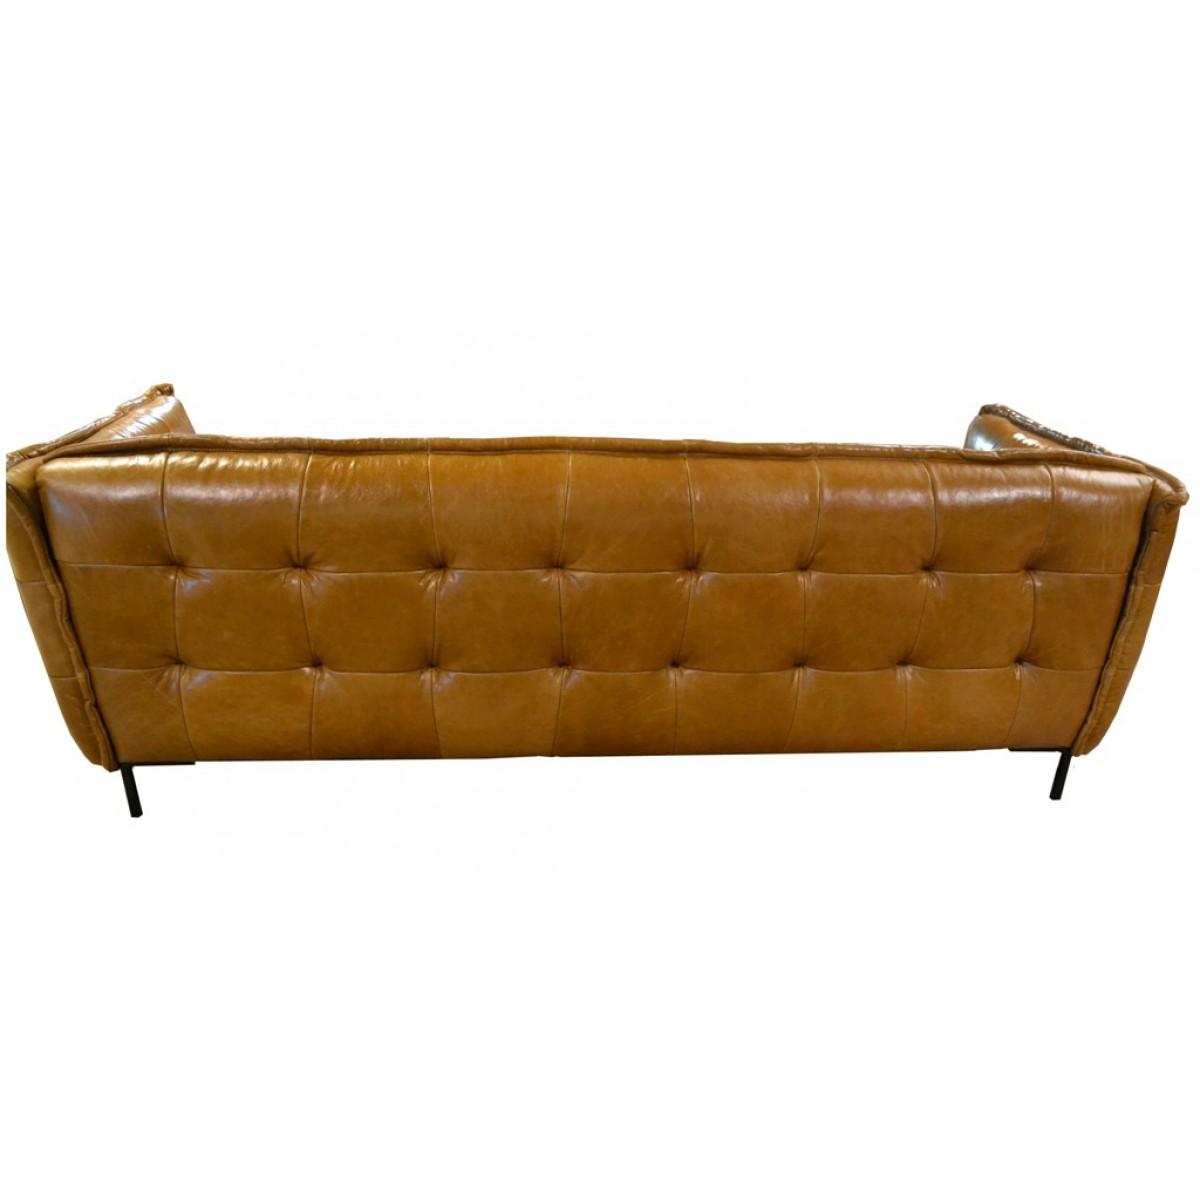 2,5-zits-bank_fauteuil_slimm_jim_patch_stof_seven_cognac_leer_tom_club_easy_sofa_rug